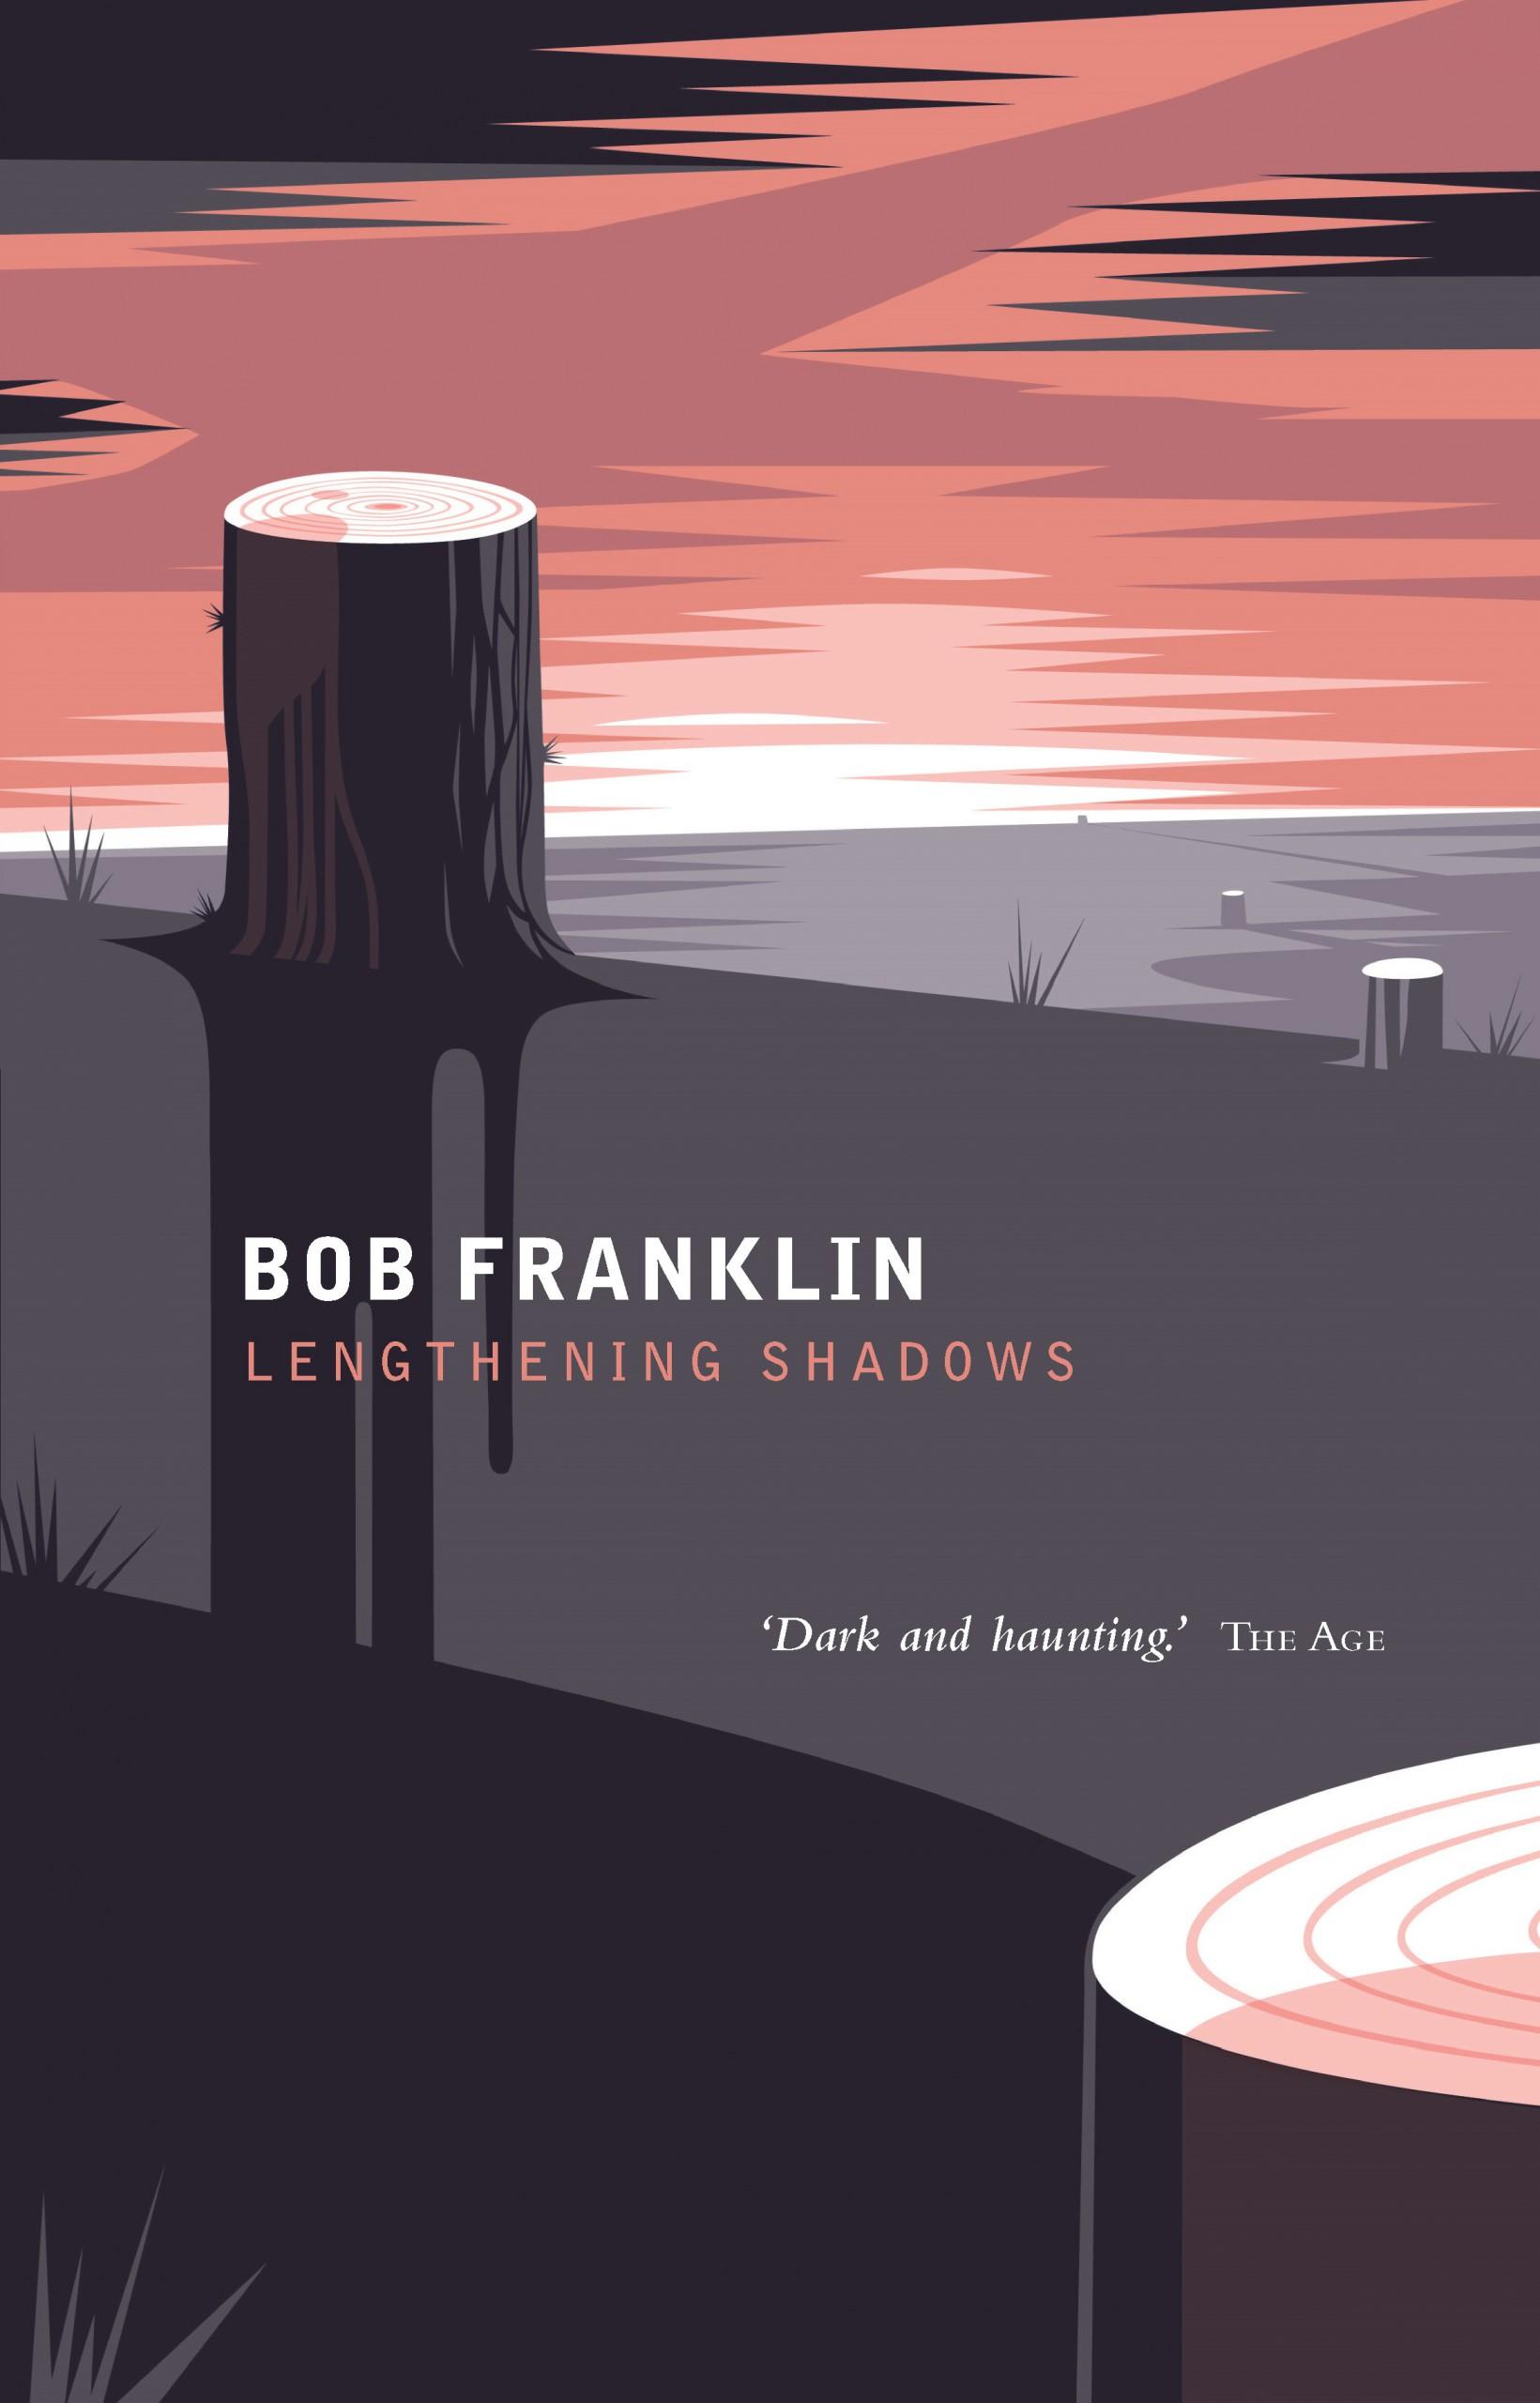 Lengthening Shadows by Bob Franklin